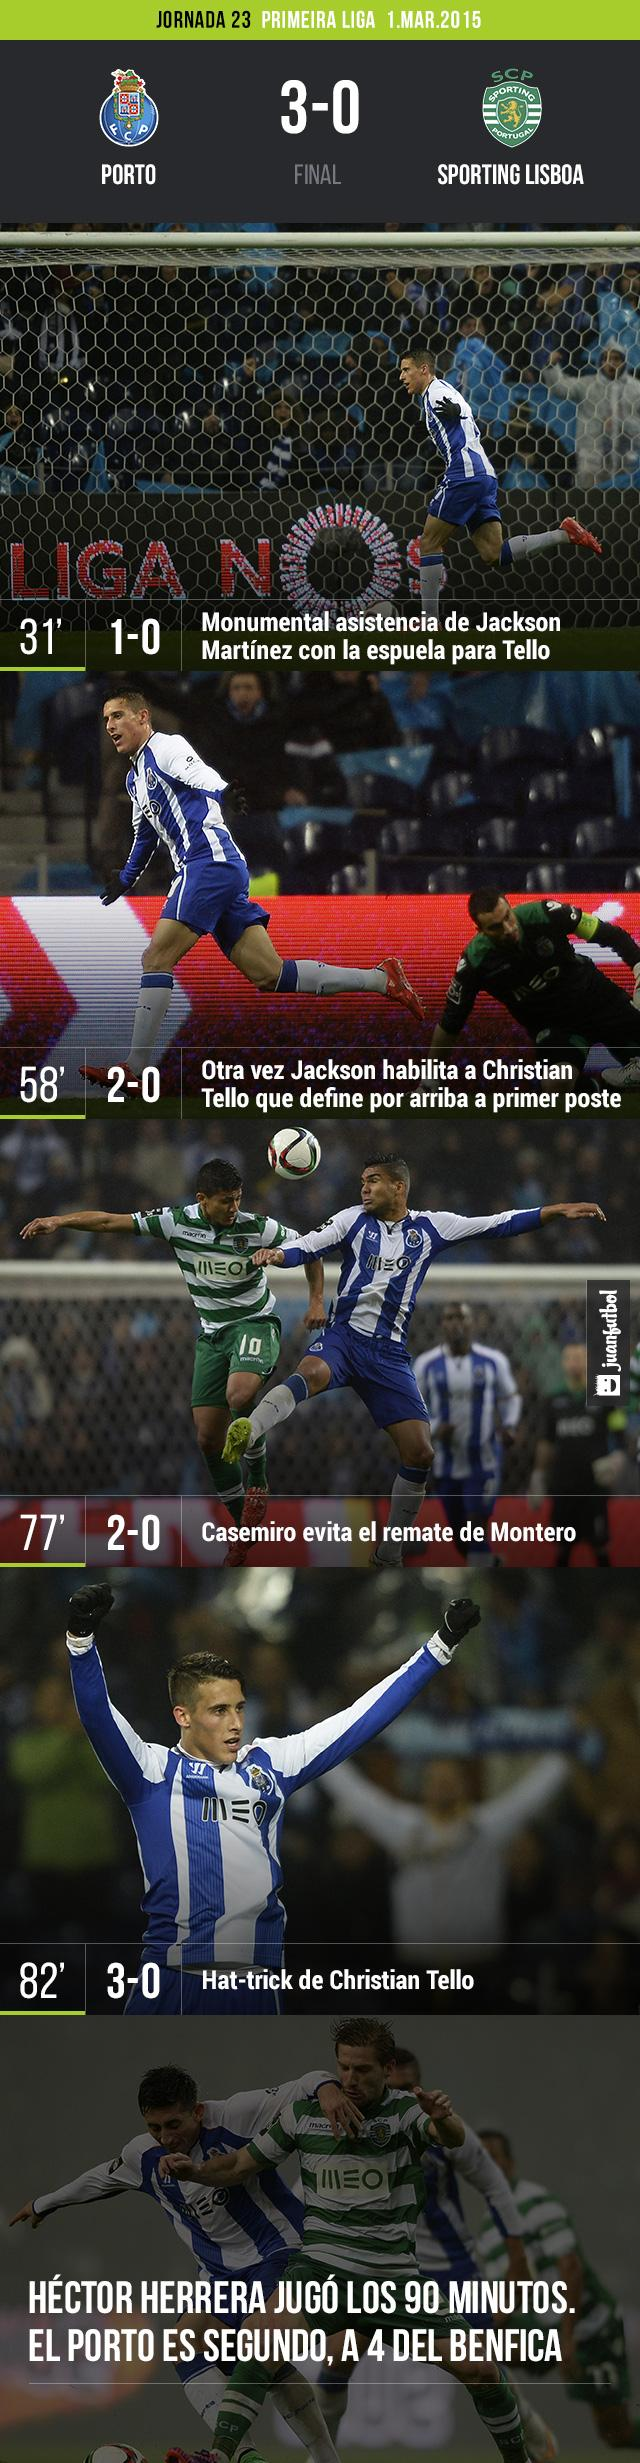 Porto 3-0 Sporting Lisboa